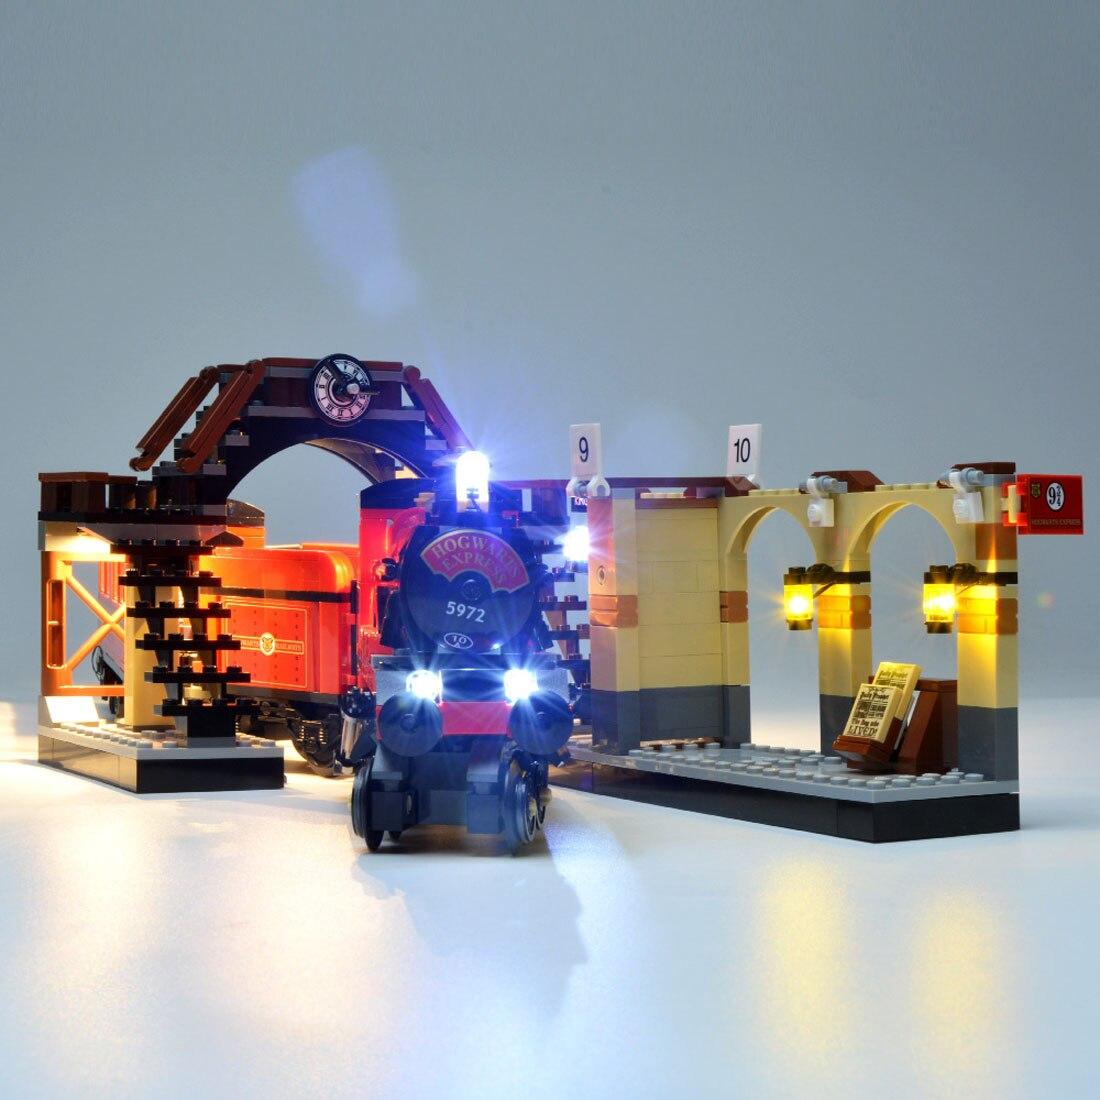 Kit de accesorios de luz LED USB para Hogwarts Express 75955 (solo luz LED, Kit sin bloqueo)